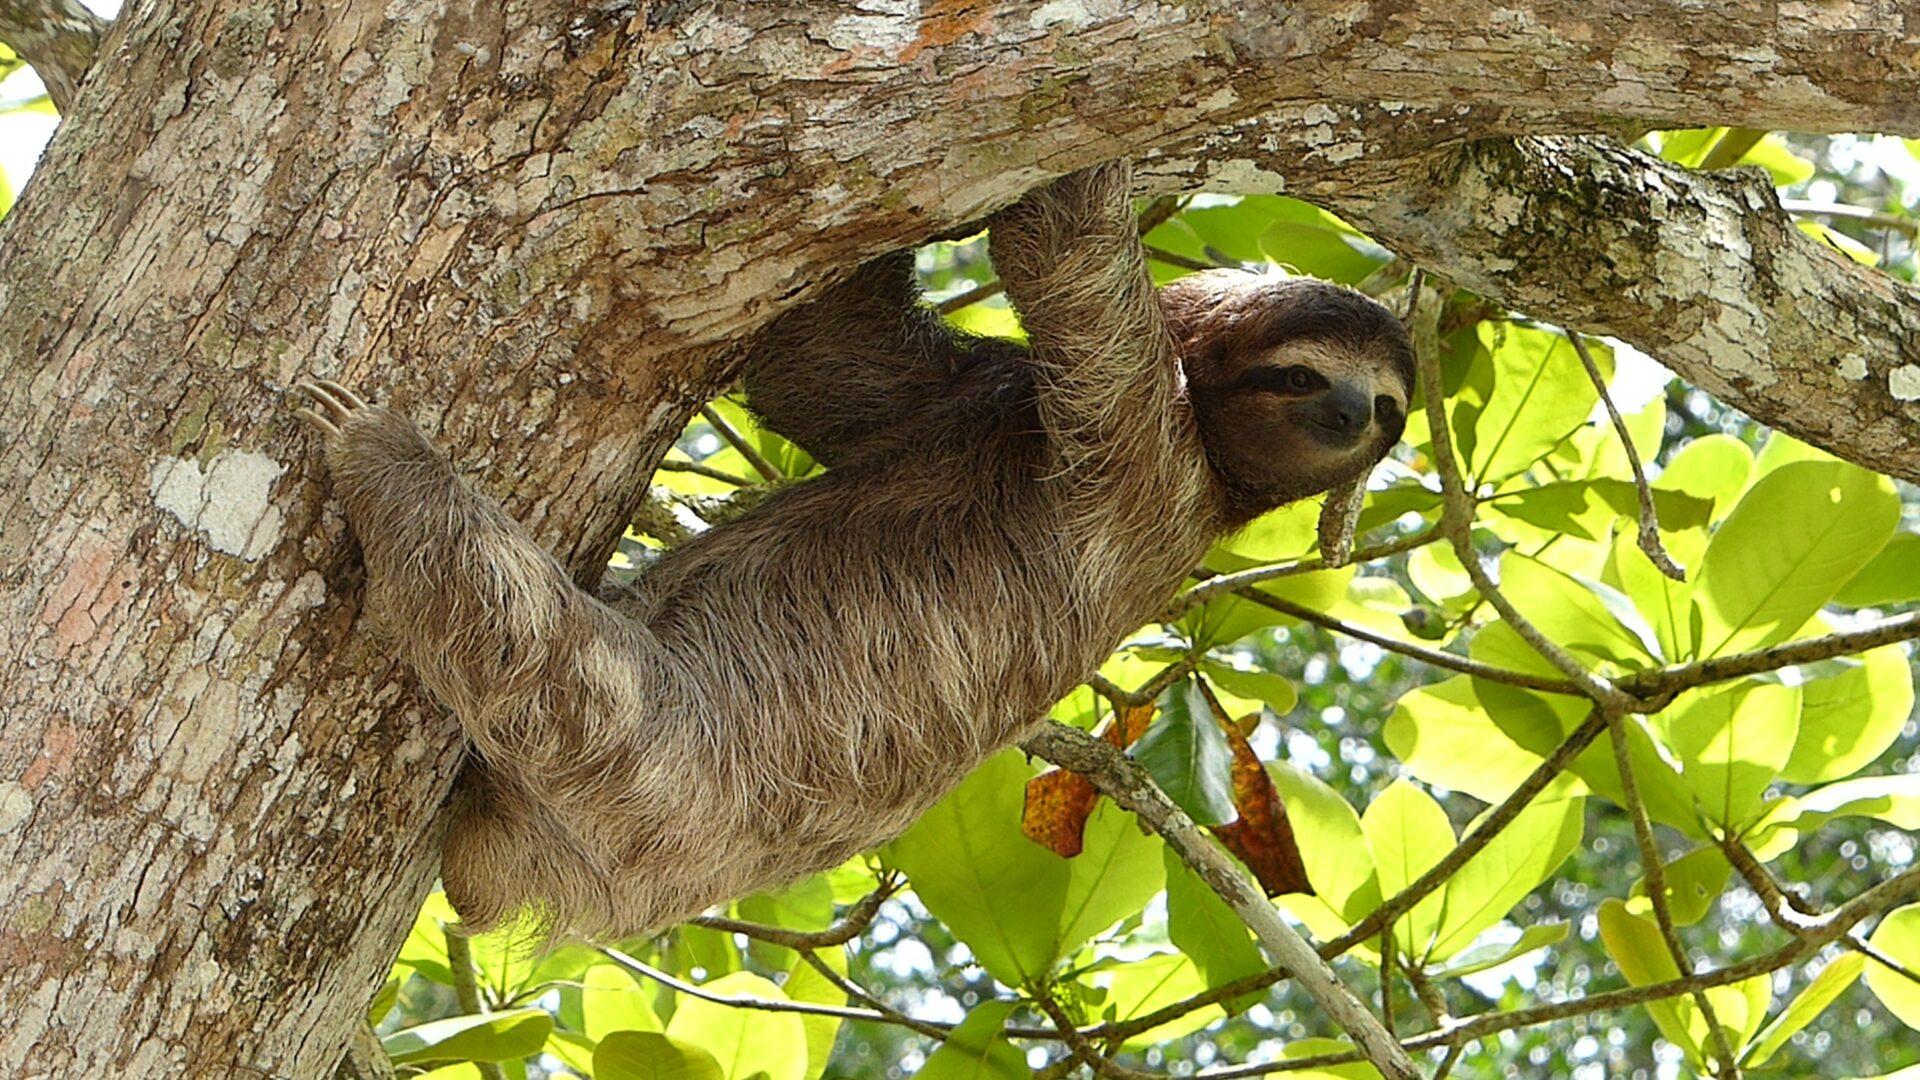 Duurzaam reizen in costa Rica - hiken in Parque Nacional Cahuita